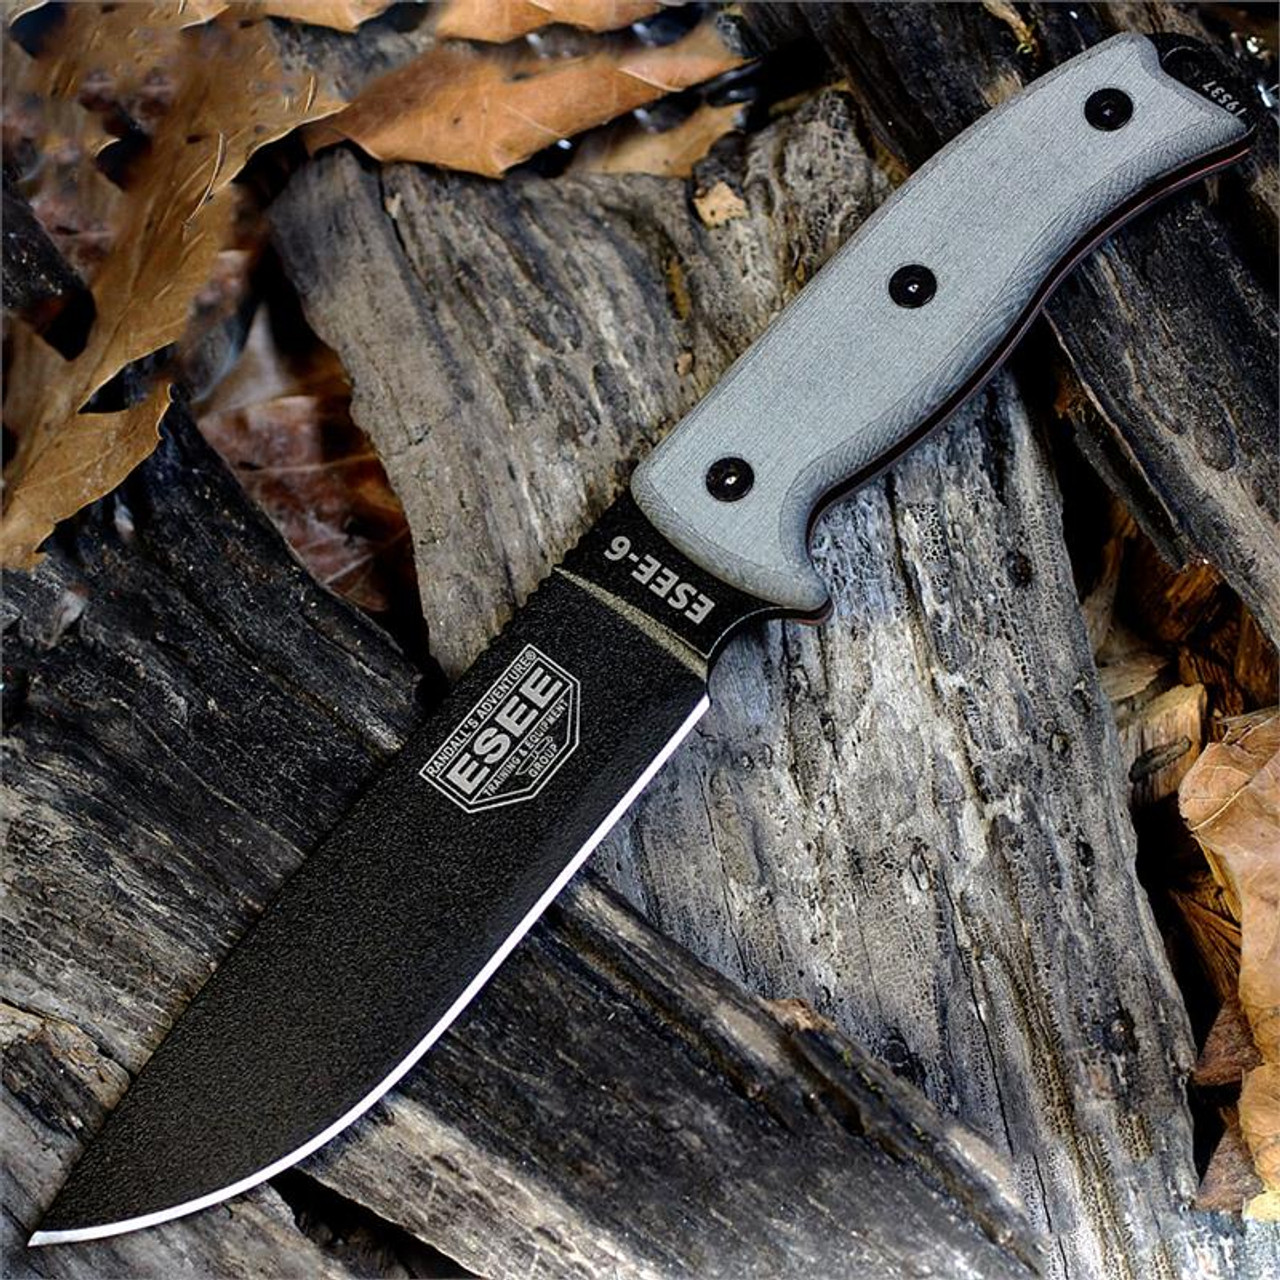 ESEE Knives, 6P-KO, Black Blade, Plain Edge, Micarta Handle, Knife Only, No Sheathing